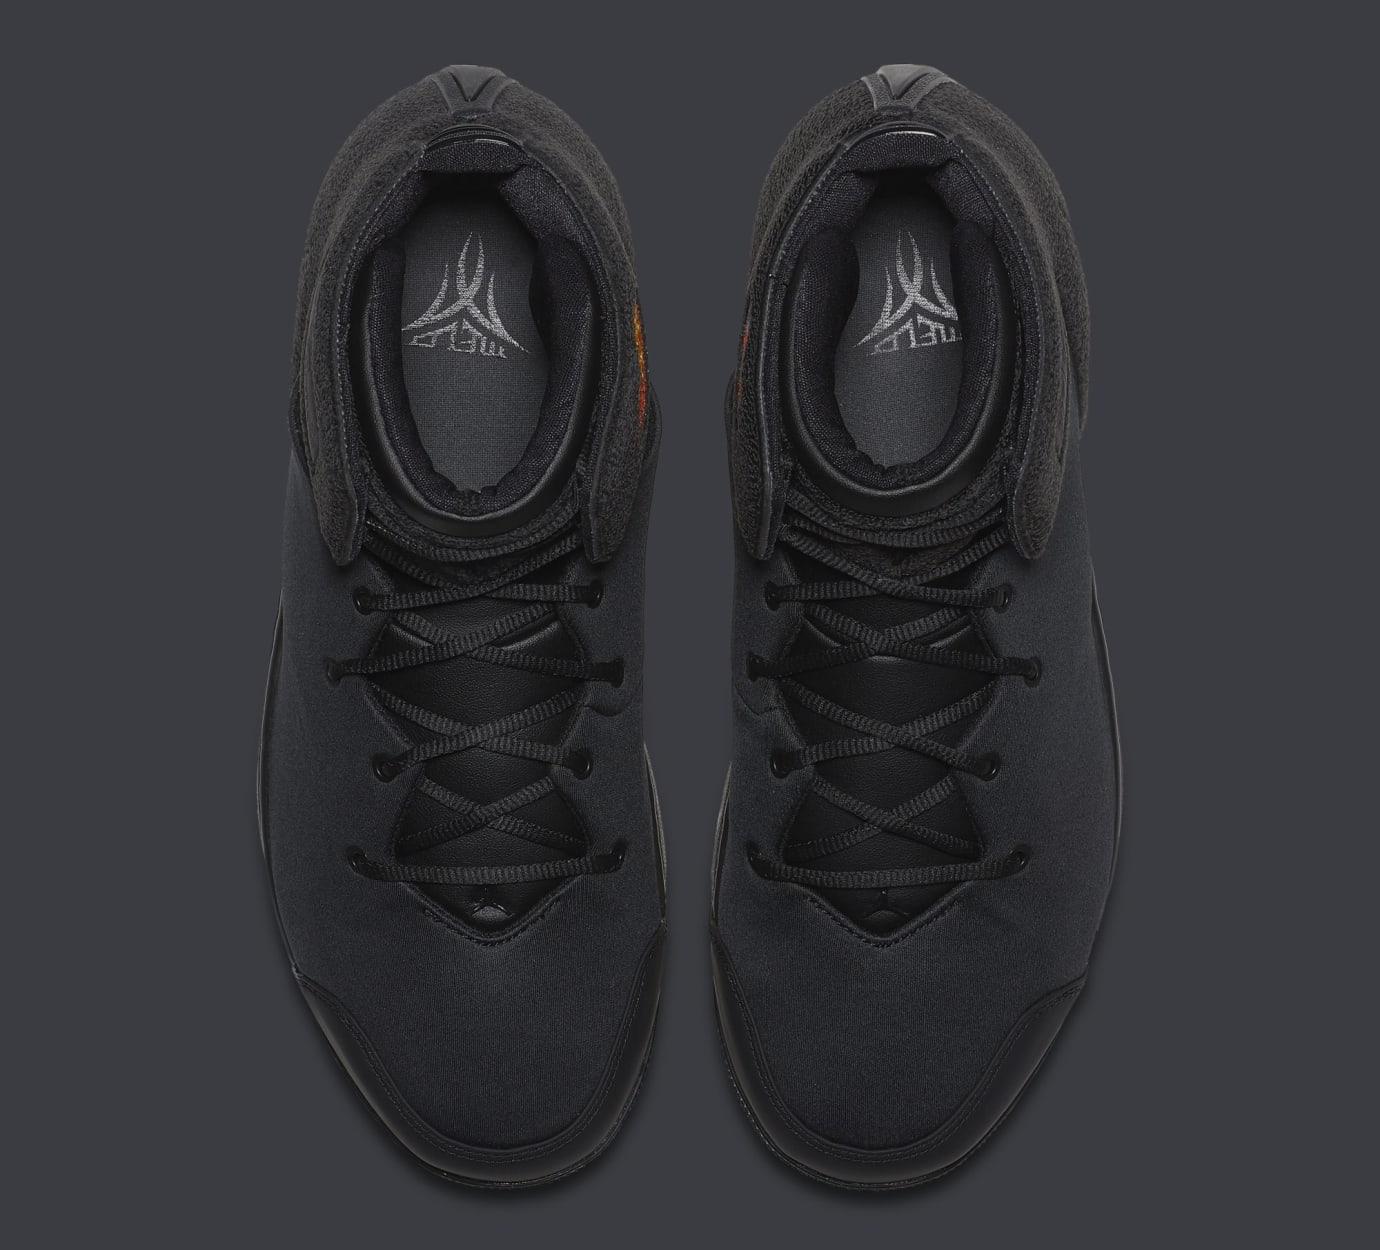 bec2ff97698c Image via Nike Jordan Melo 1.5 SE  Hoodie Melo  AT5386-001 (Top)